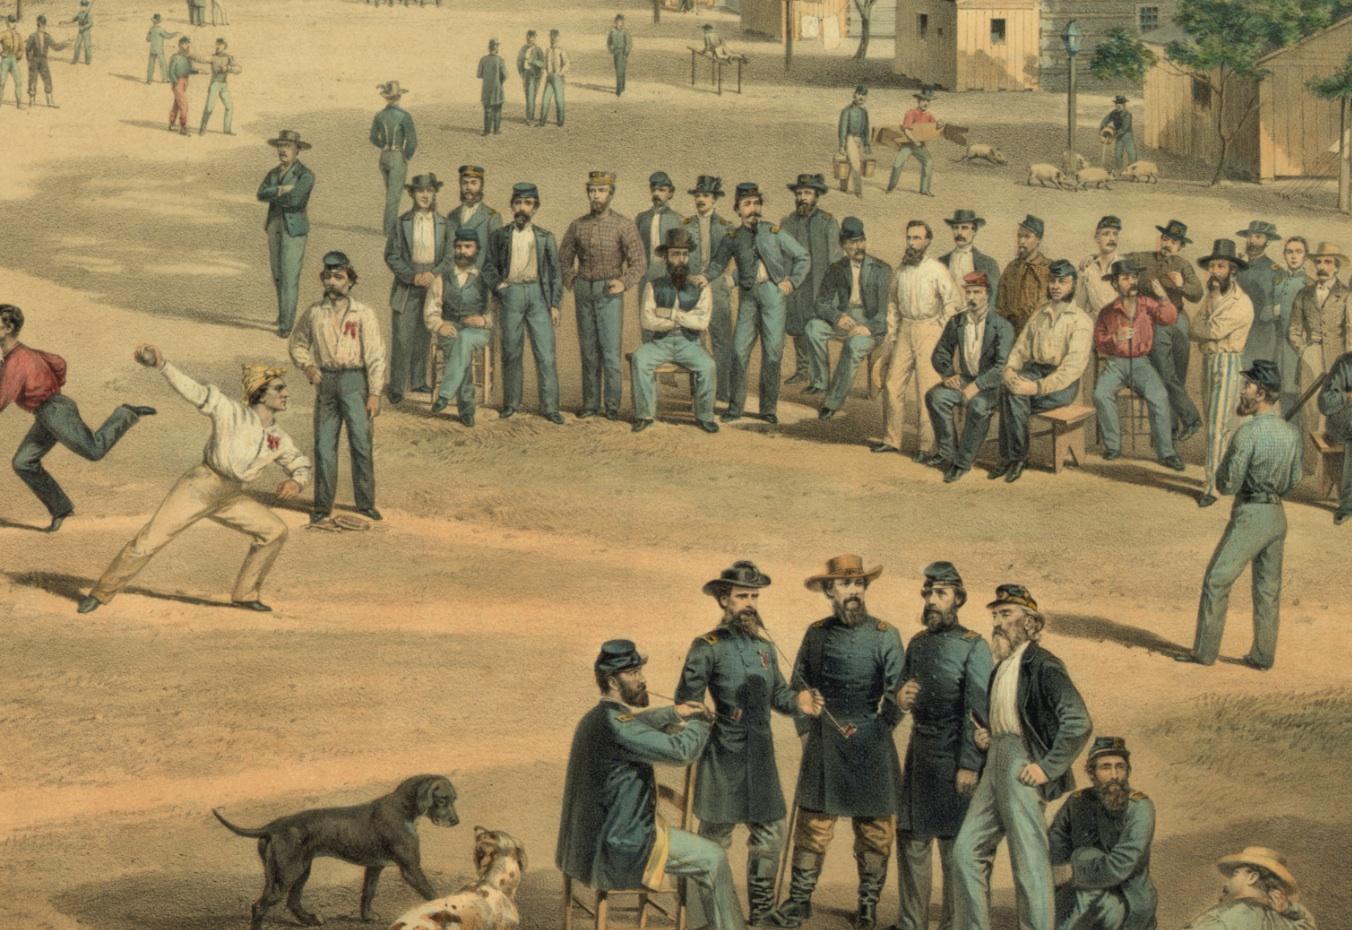 The history of baseball